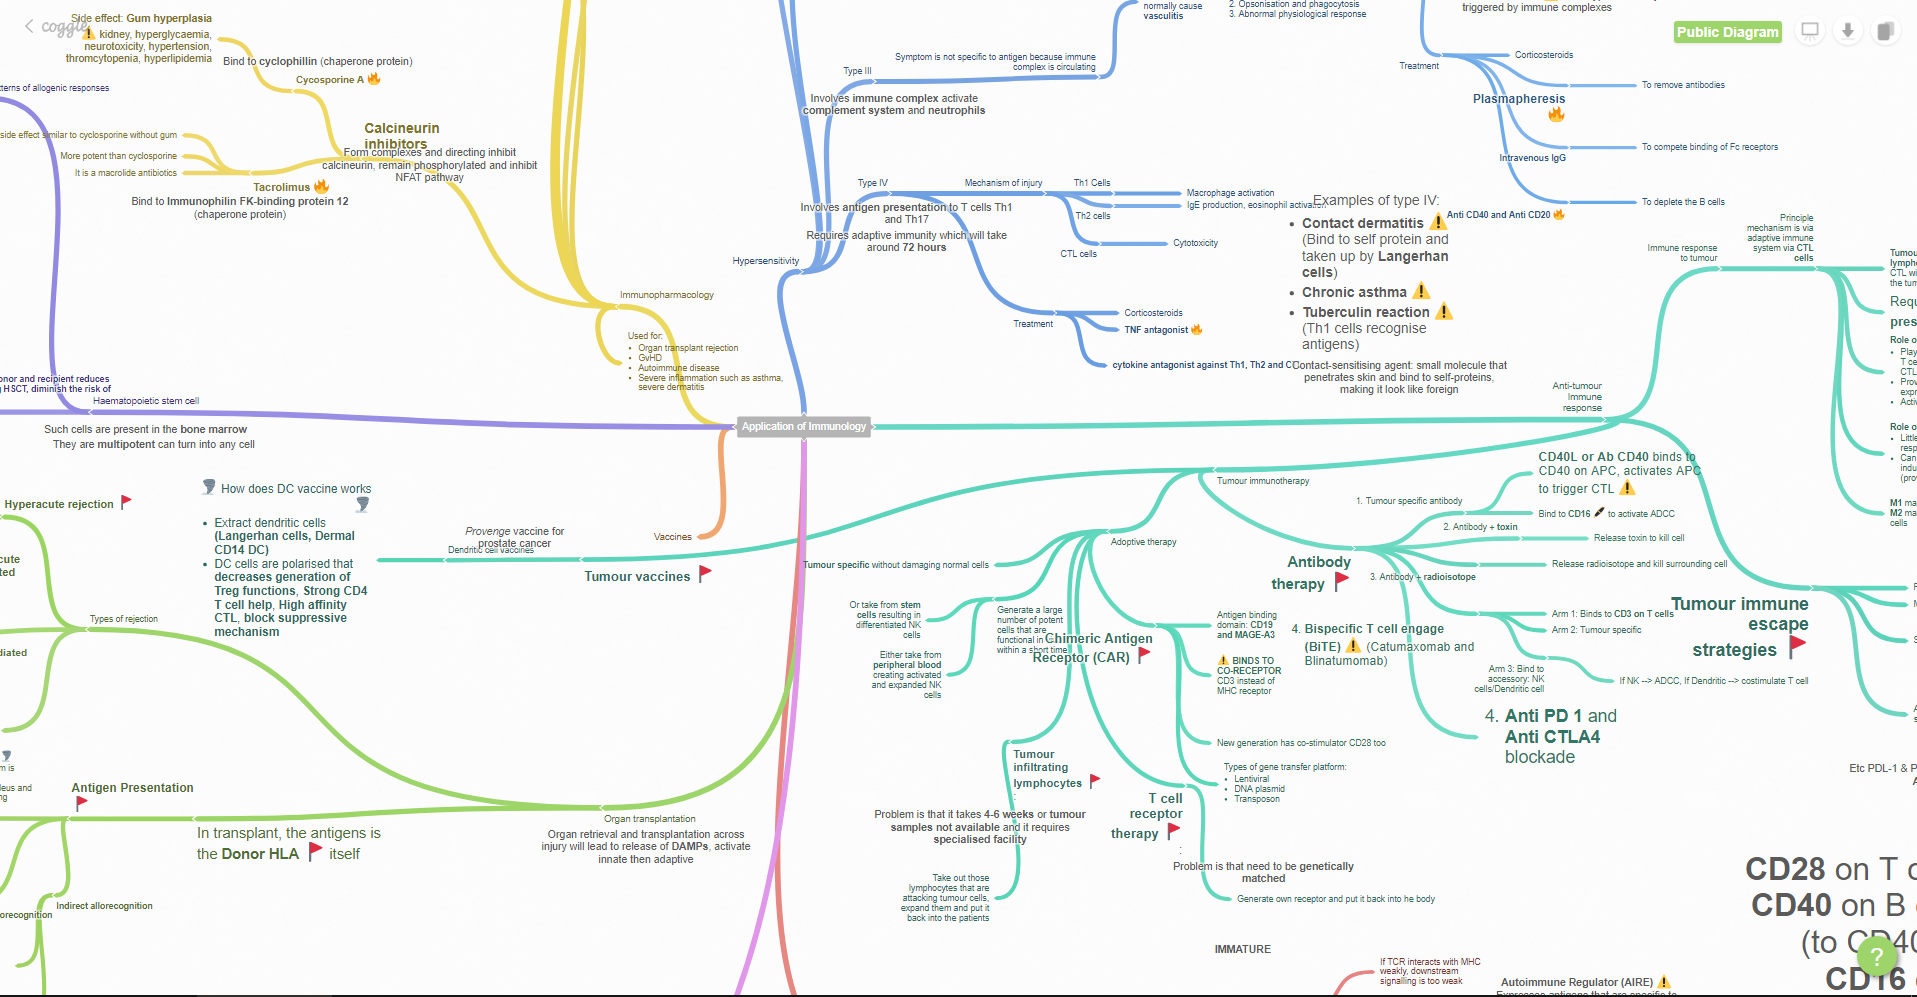 mapa mental virtual conceptual herramienta coggle